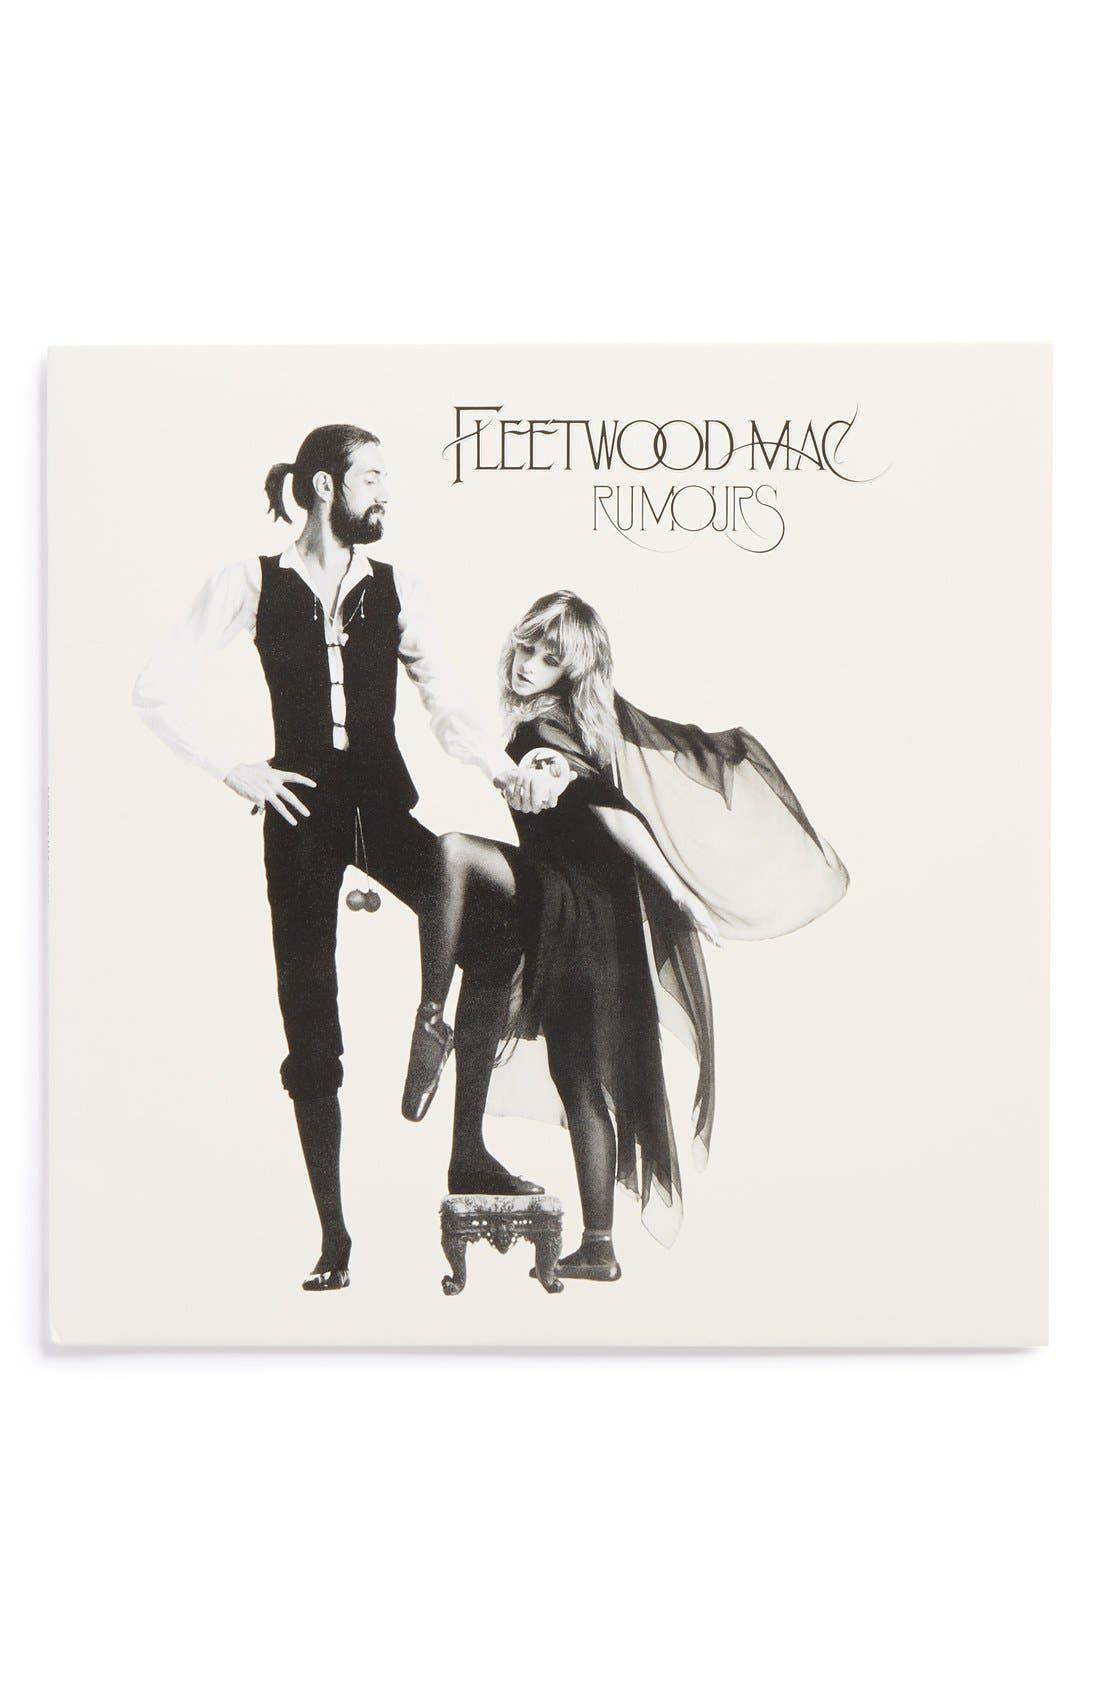 Fleetwood Mac 'Rumours' LP Vinyl Record